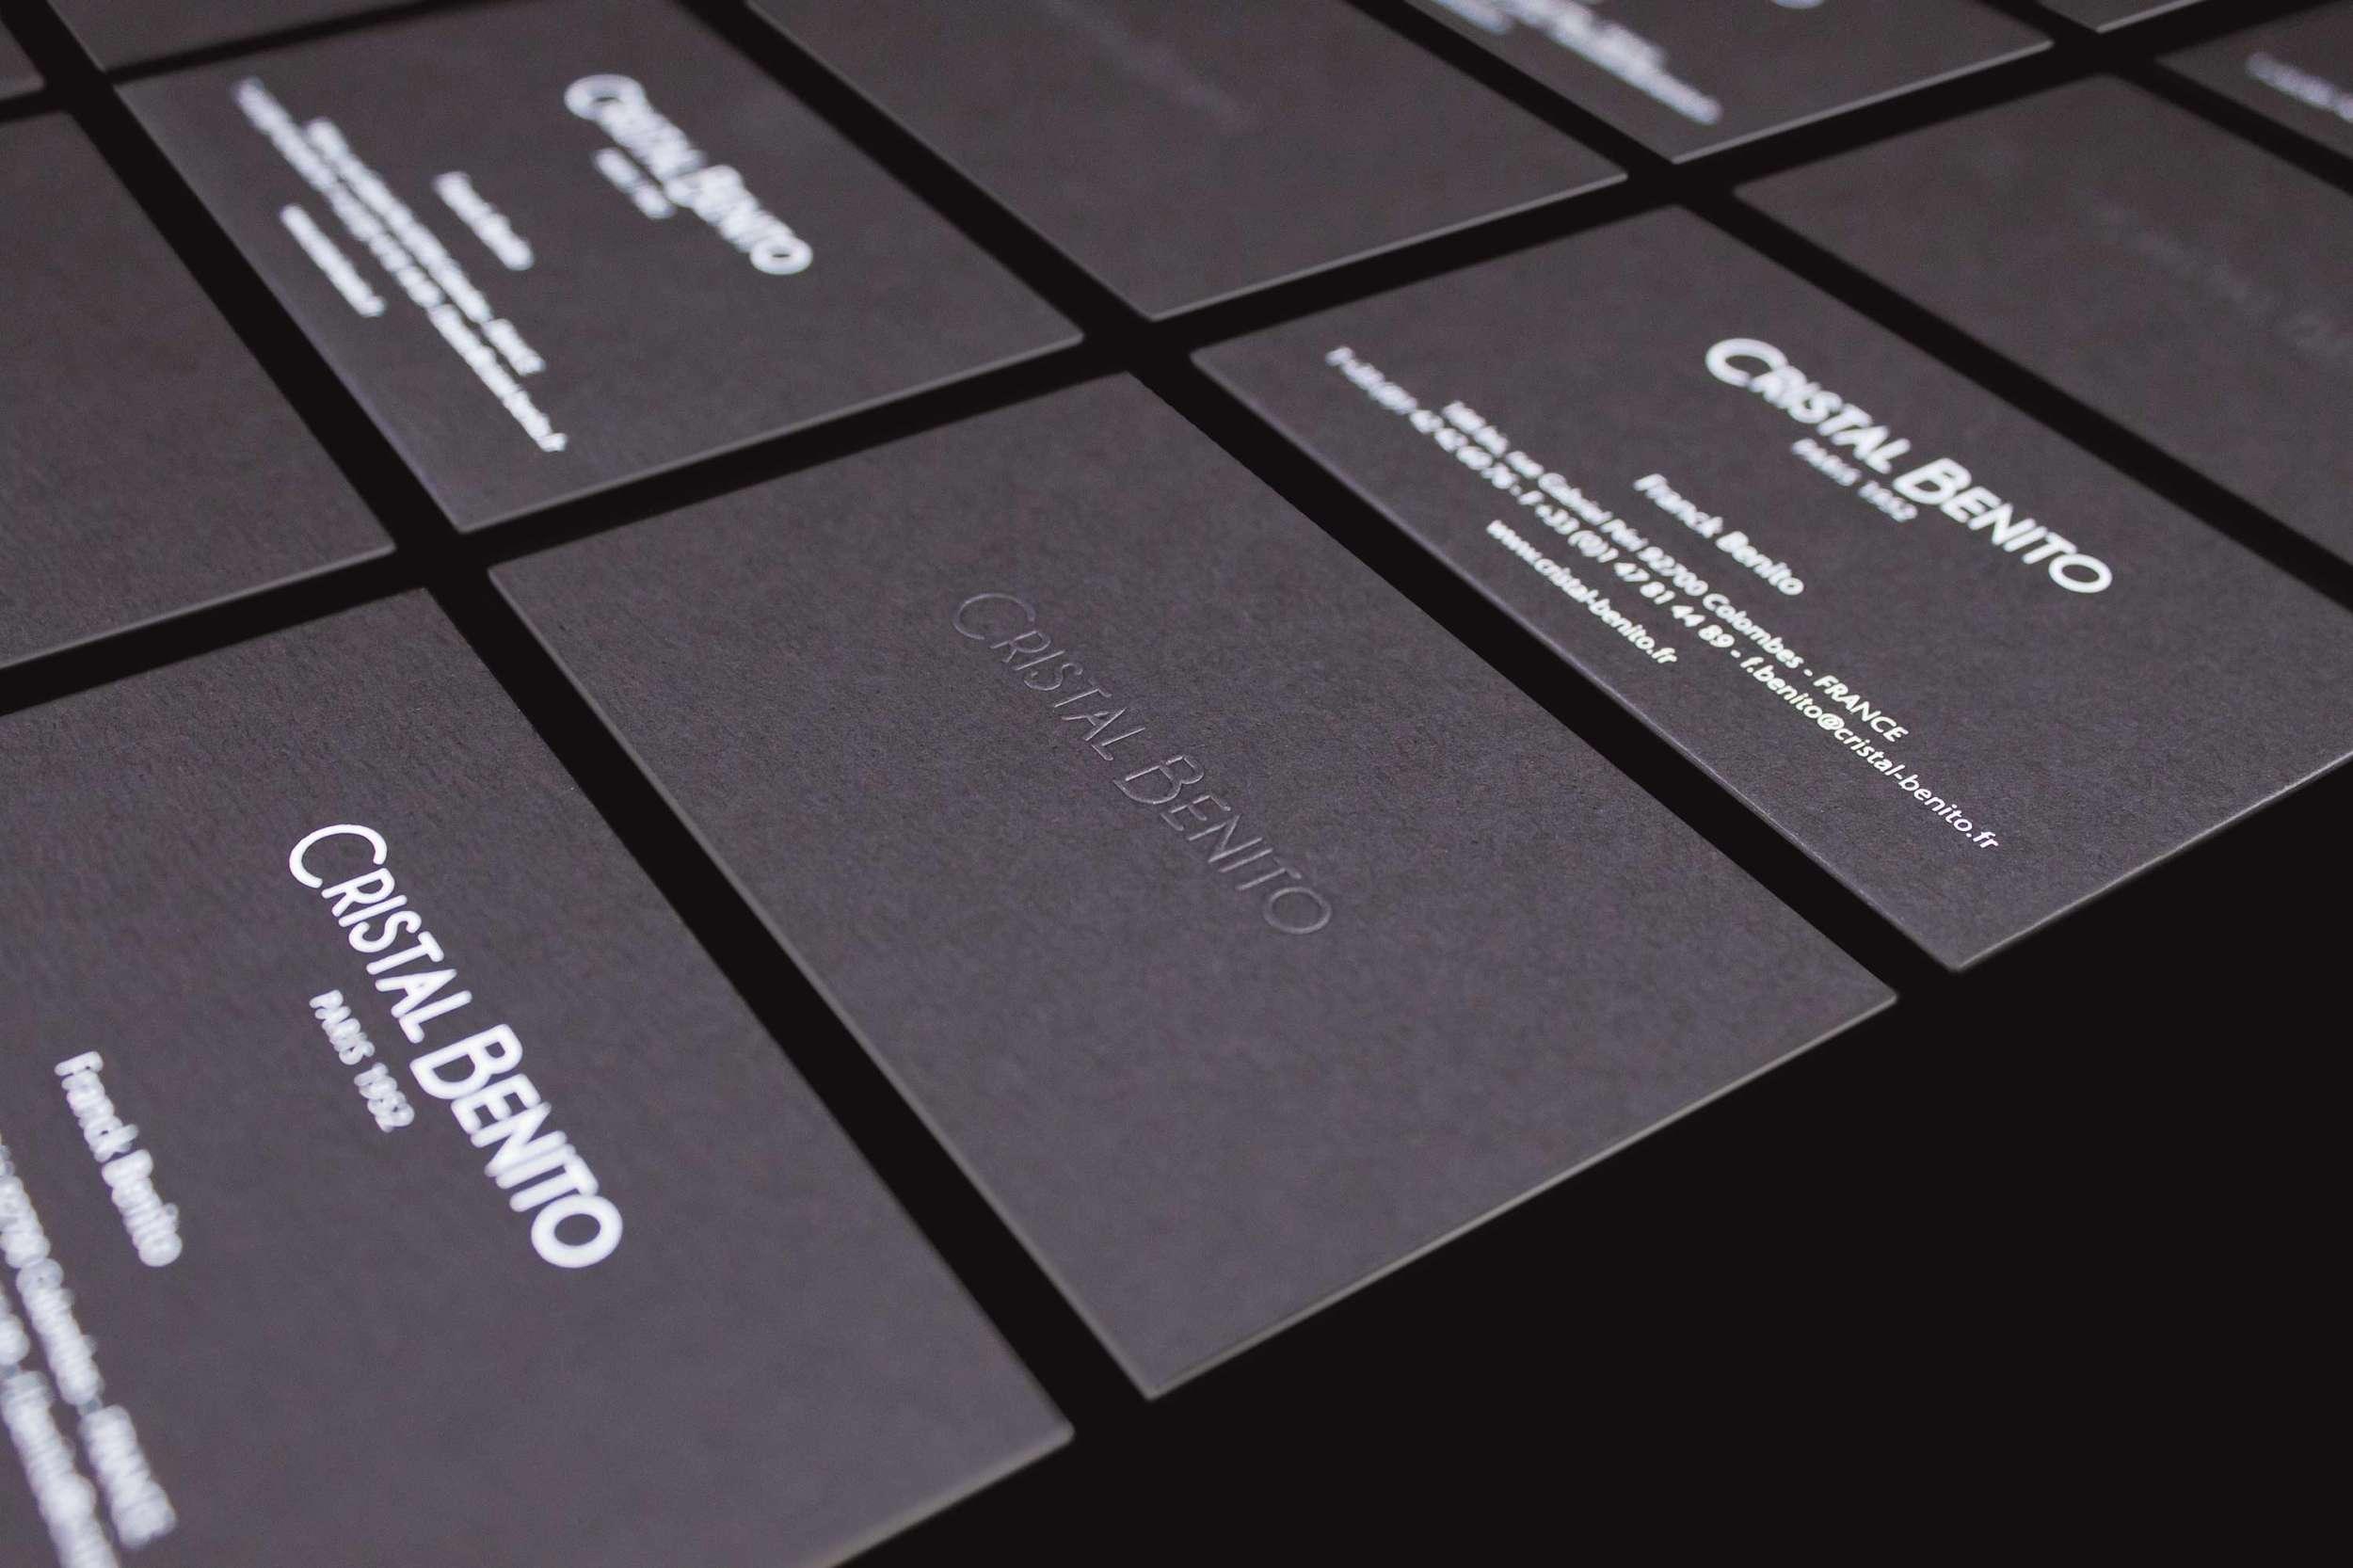 Cristal-Benito-creation-identite-visuelle-2098.jpg